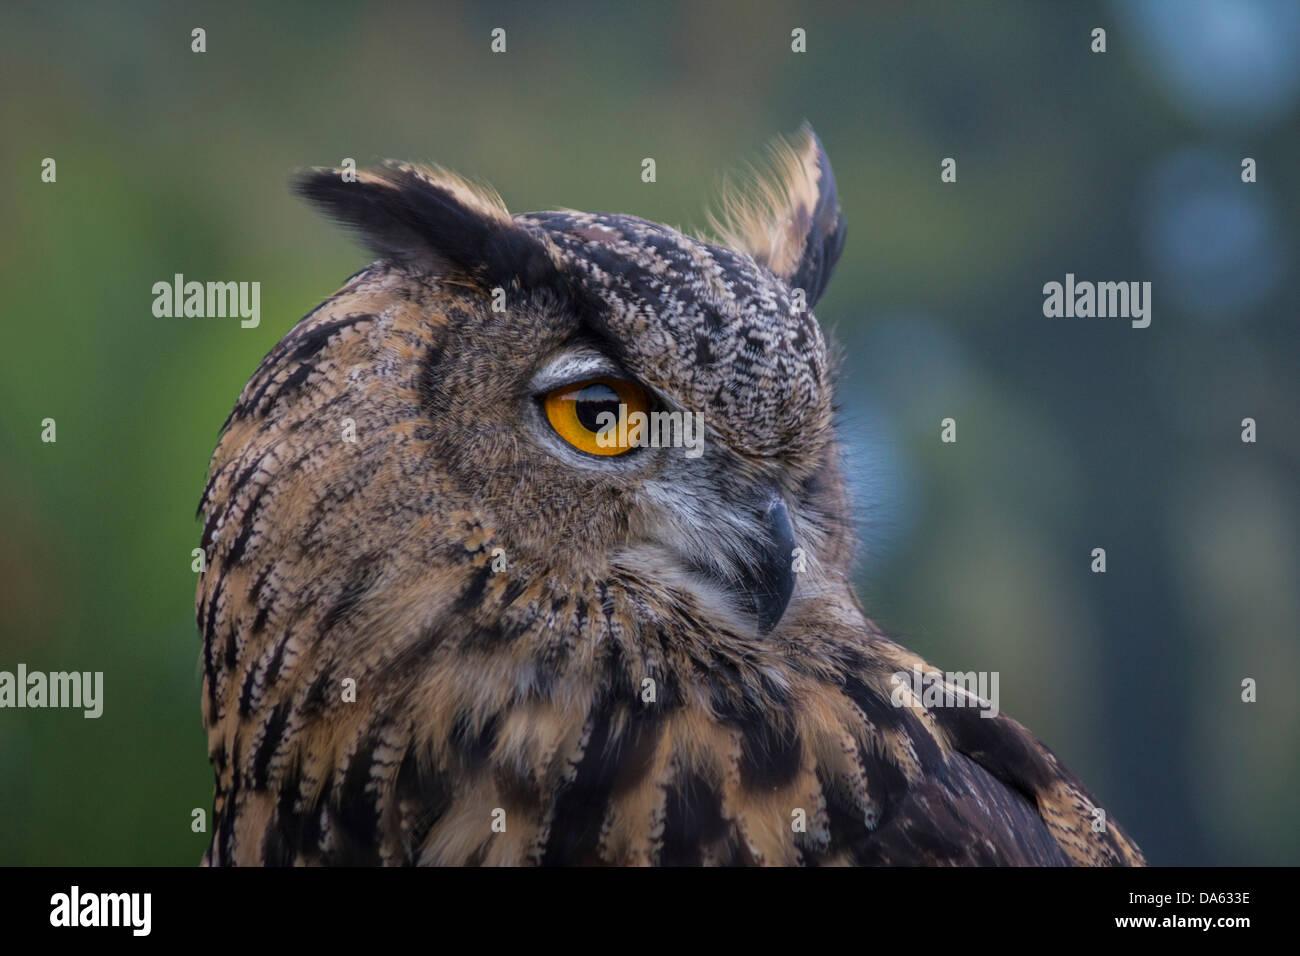 Vögel der Beute, Vogel, Blackland Prairie Raptor Center, Bubo Virginianus, große gehörnte Eule, Eule, Stockbild